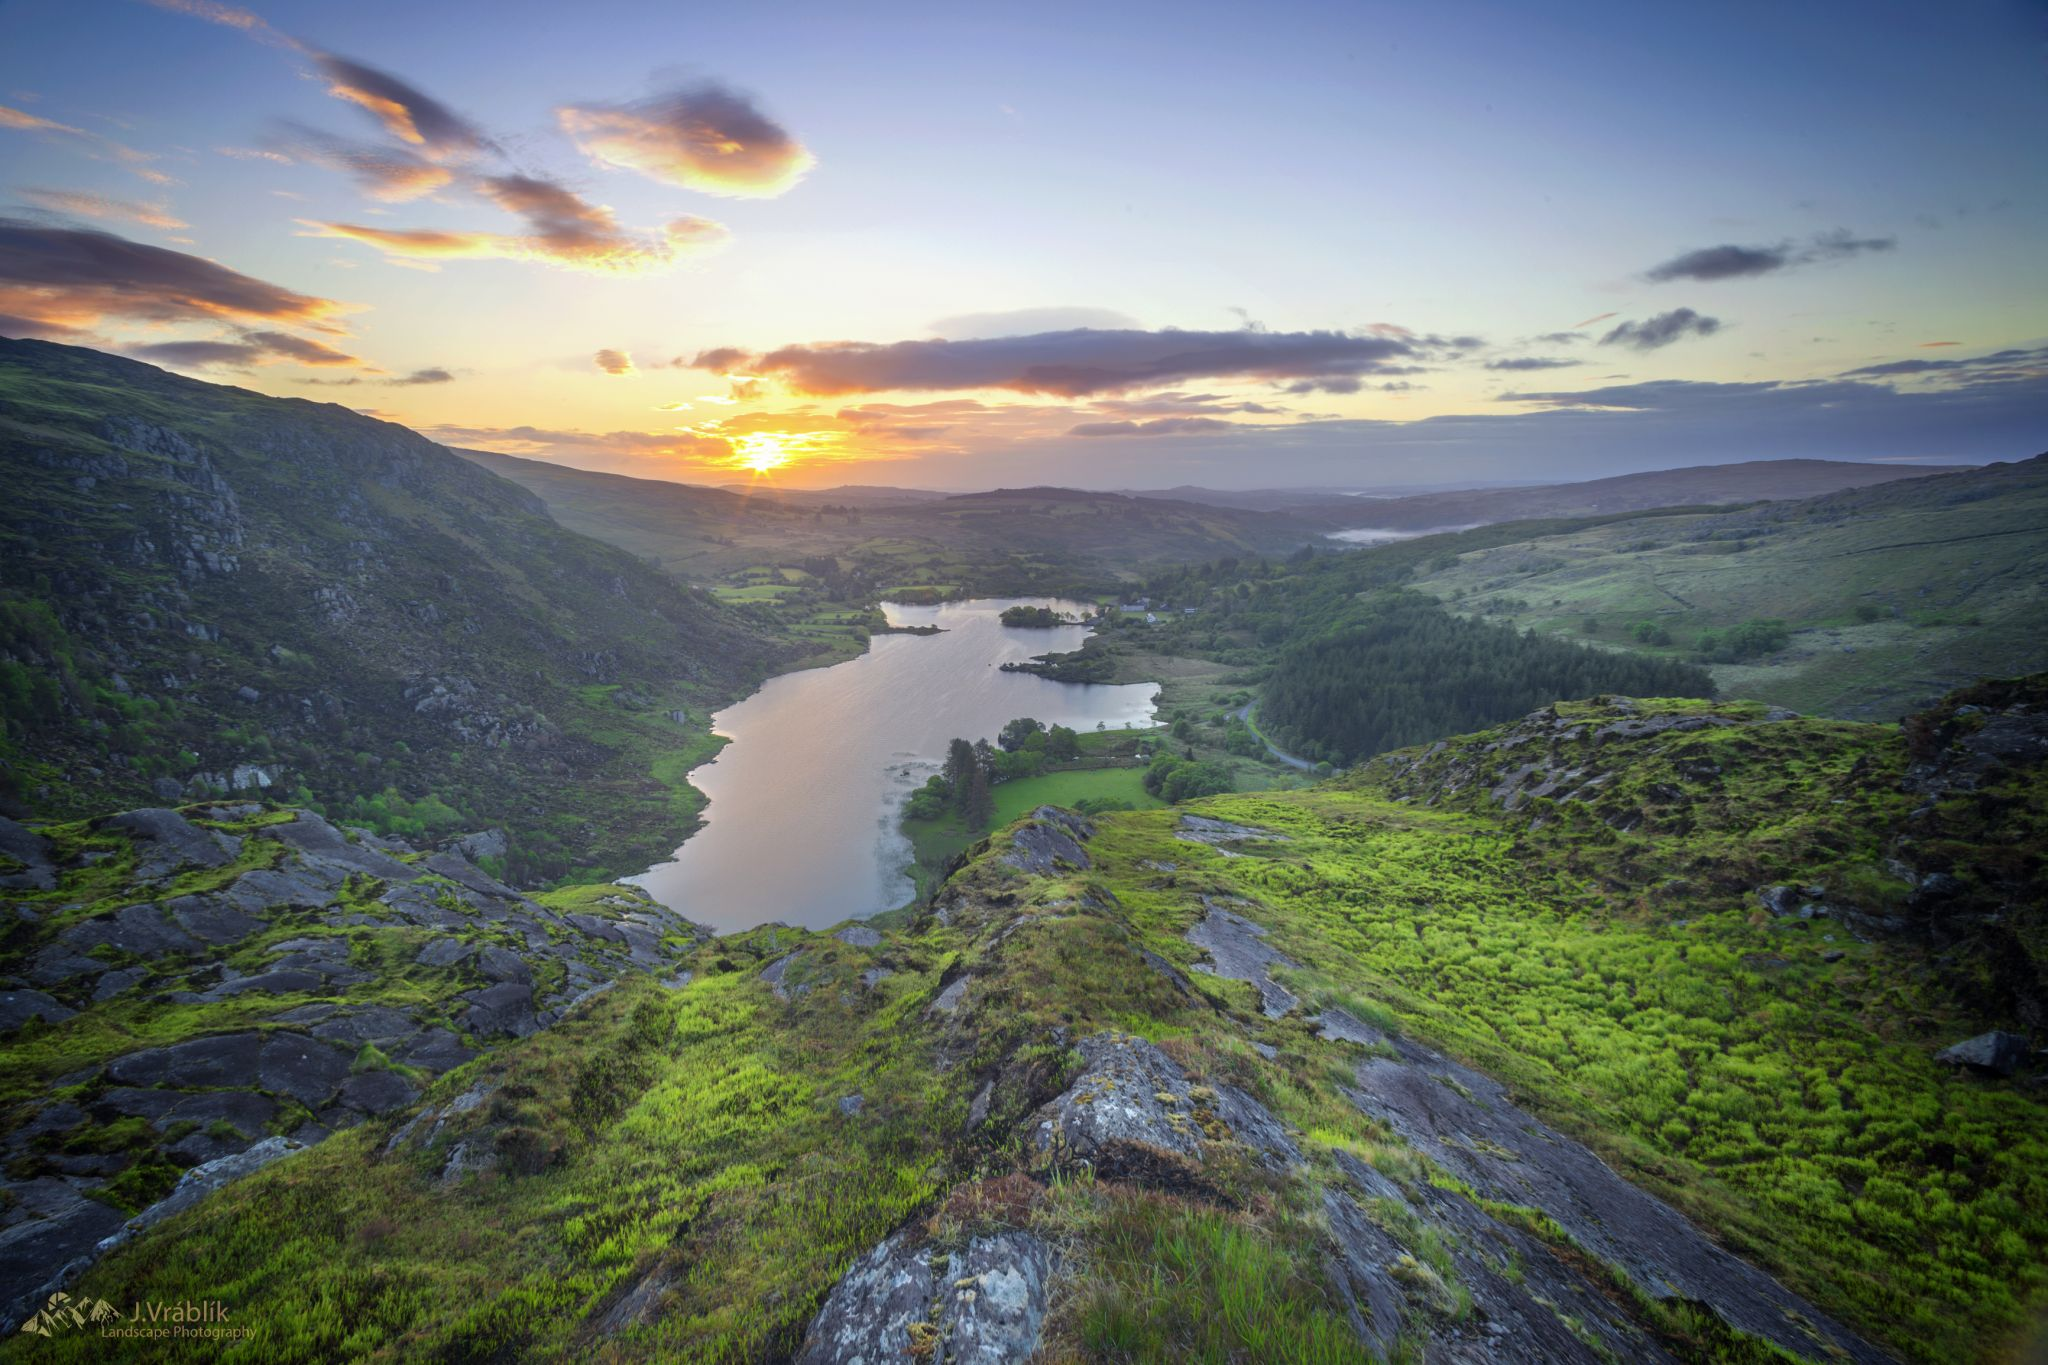 Gougane Barra viewpoint, Ireland